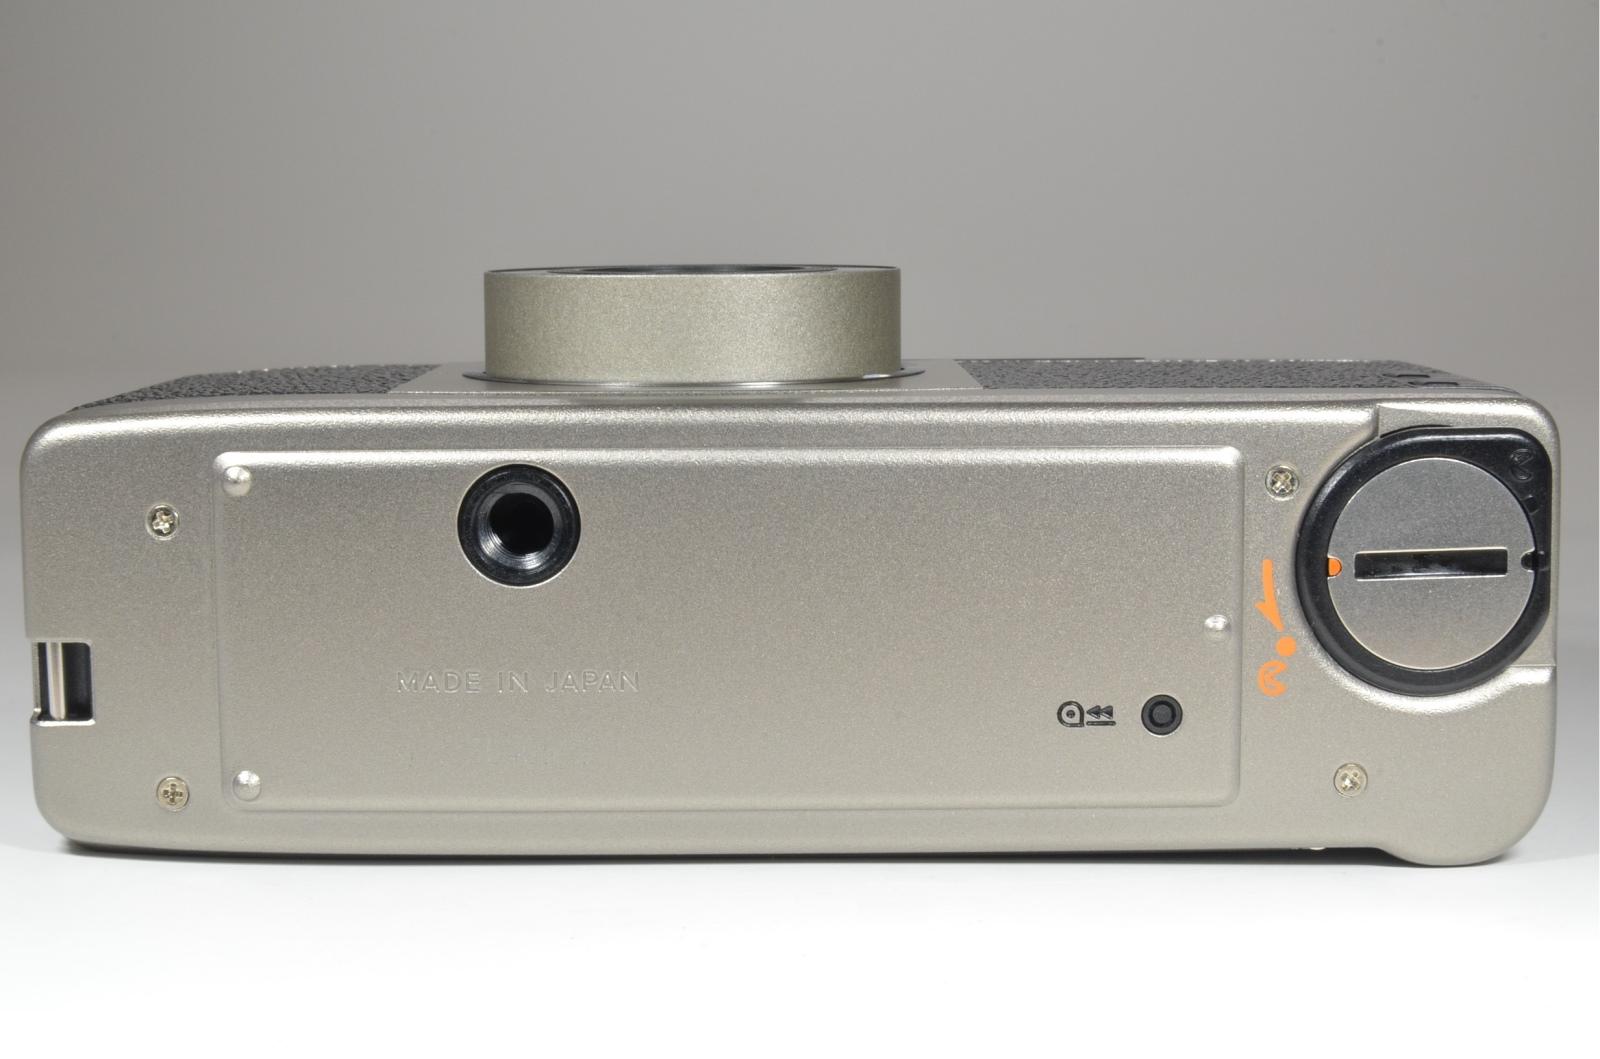 nikon 35ti point & shoot 35mm film camera 35mm f2.8 'brand-new' very rare!